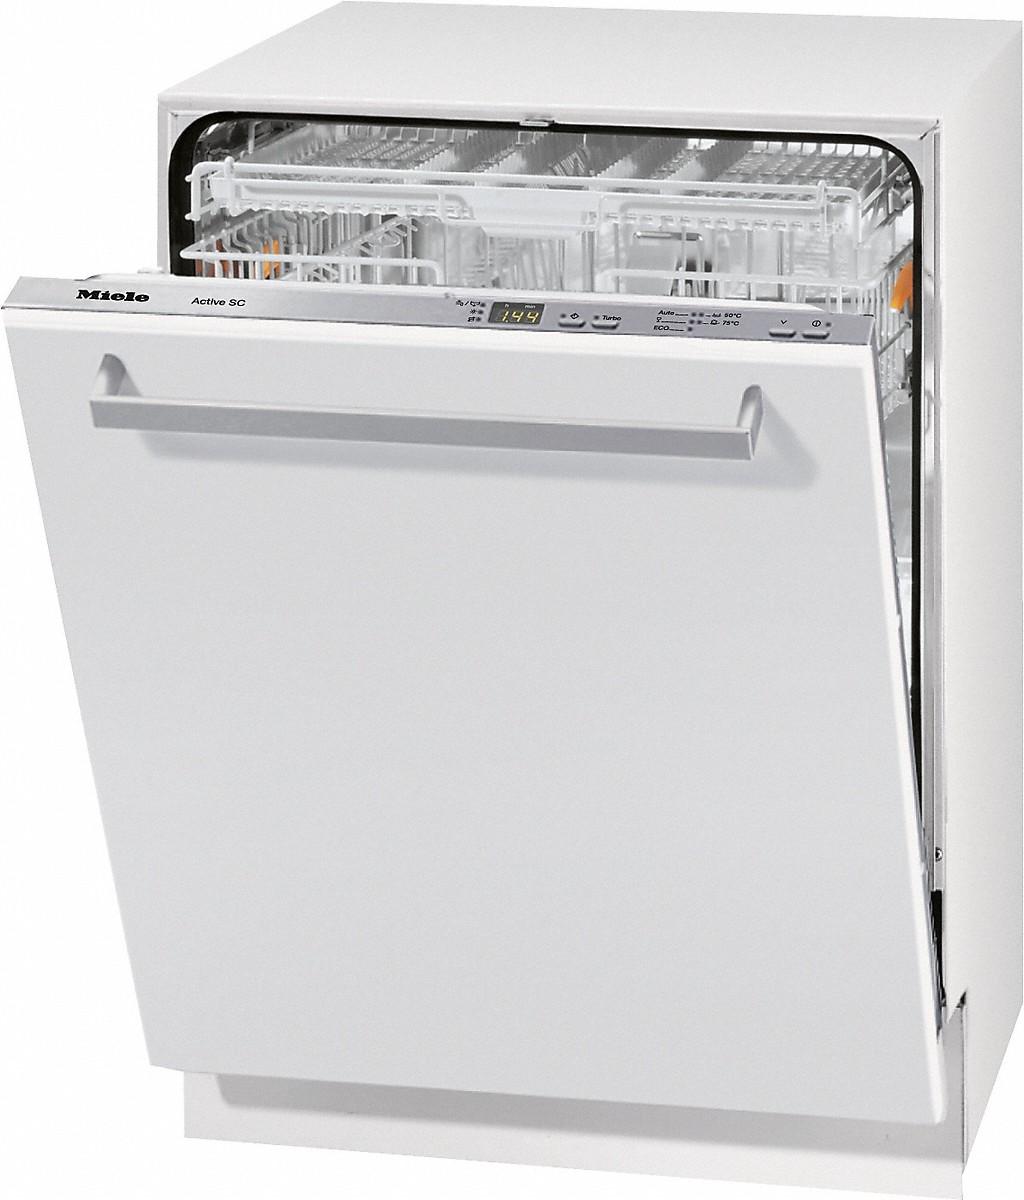 Miele G 4263 Scvi Active Vollintegrierter Geschirrspuler